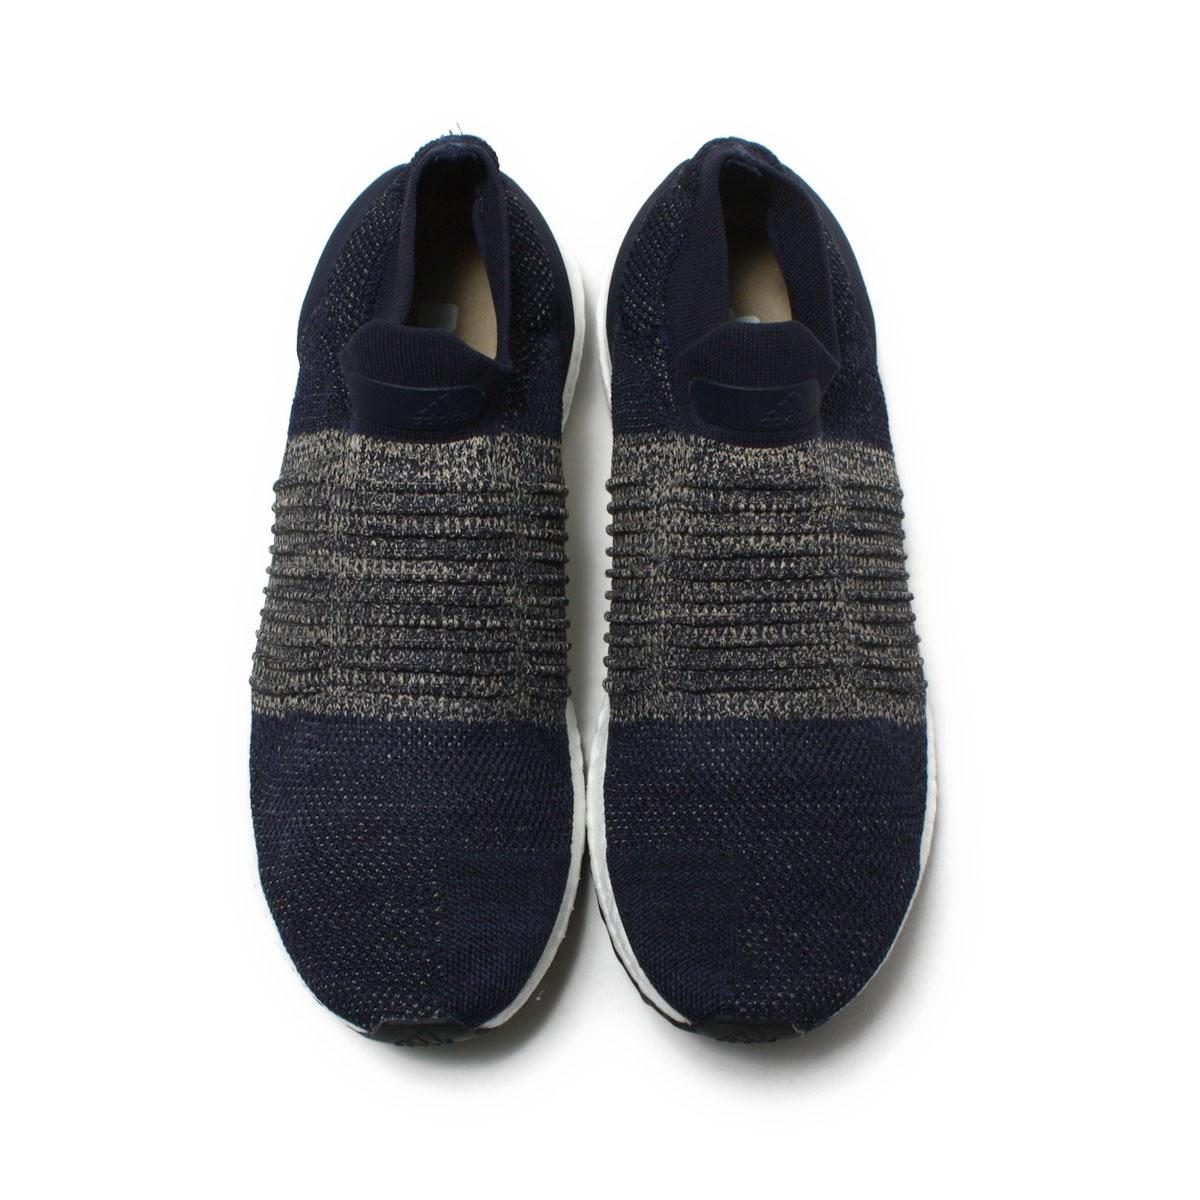 atmos tokyo: adidas UltraBOOST LACELESS (Adidas ultra boost